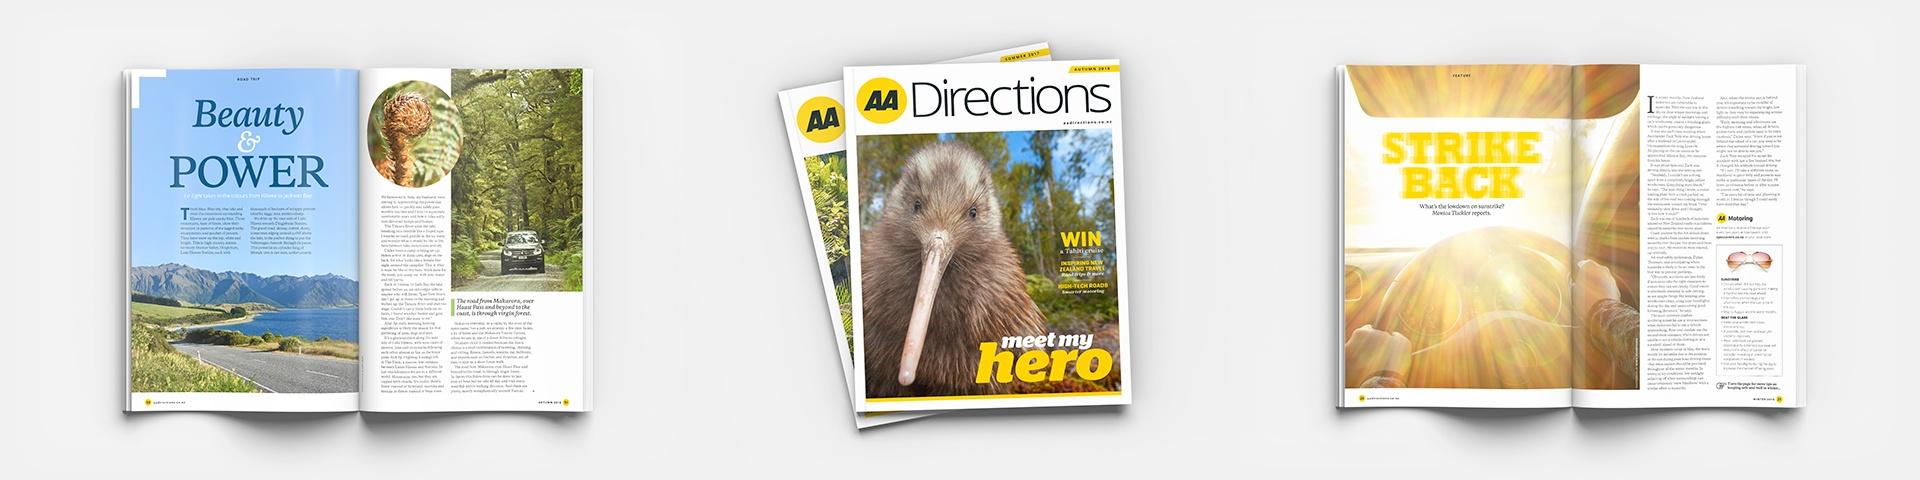 AA Directions